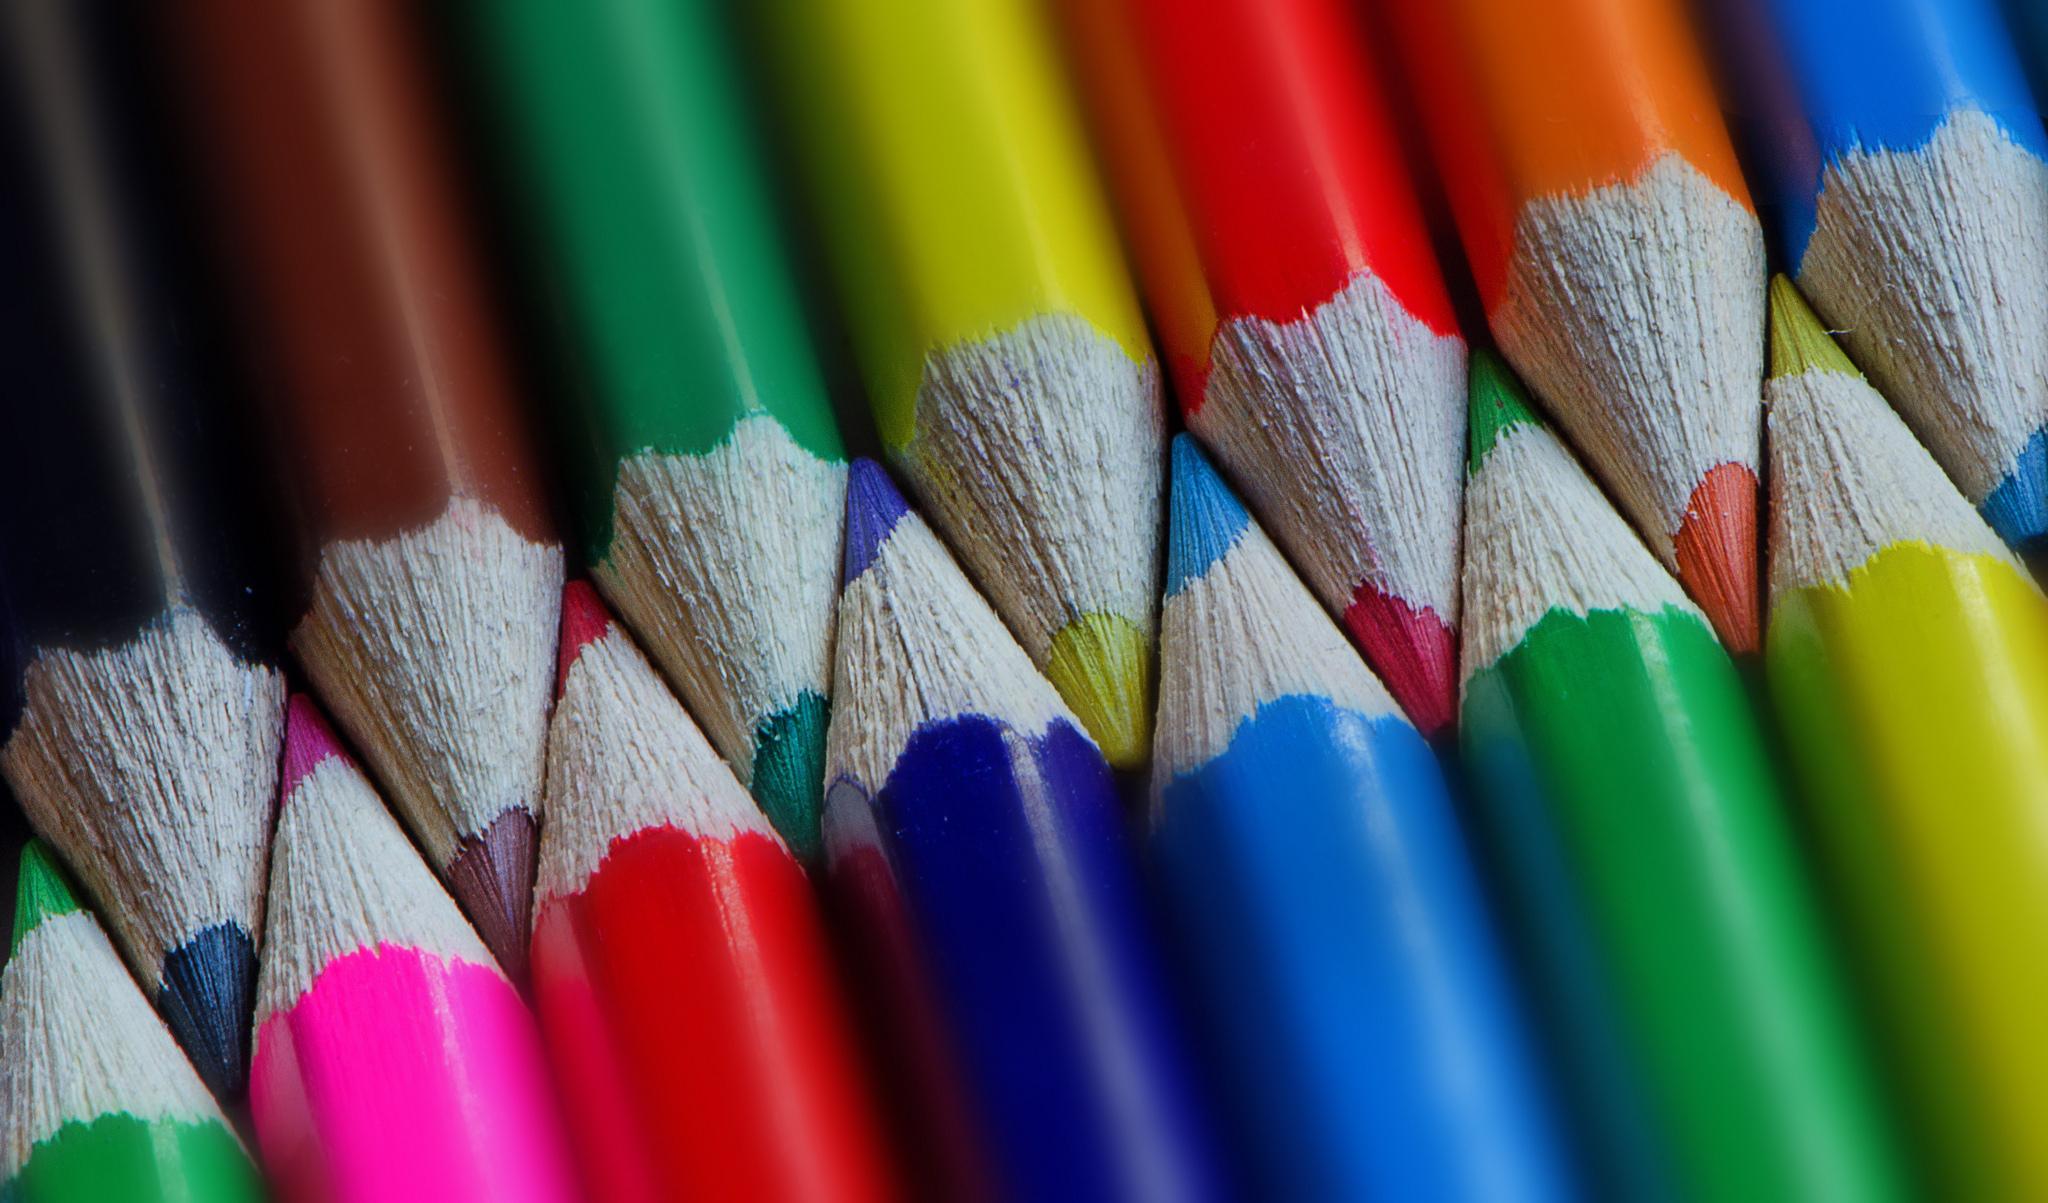 Картинки карандашей на рабочий стол